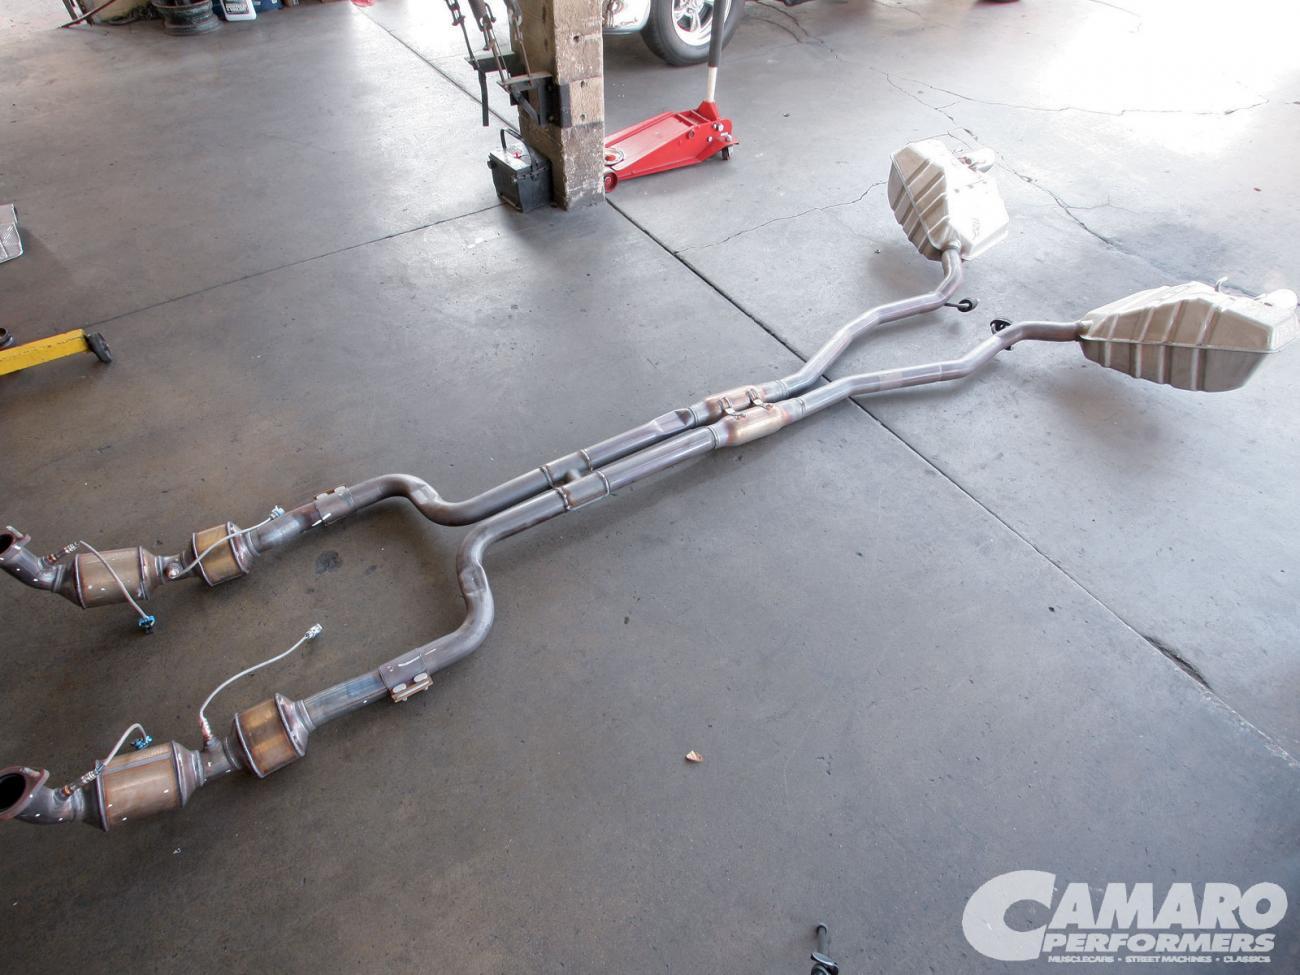 Exhaust Picture - Camaro5 Chevy Camaro Forum / Camaro ZL1